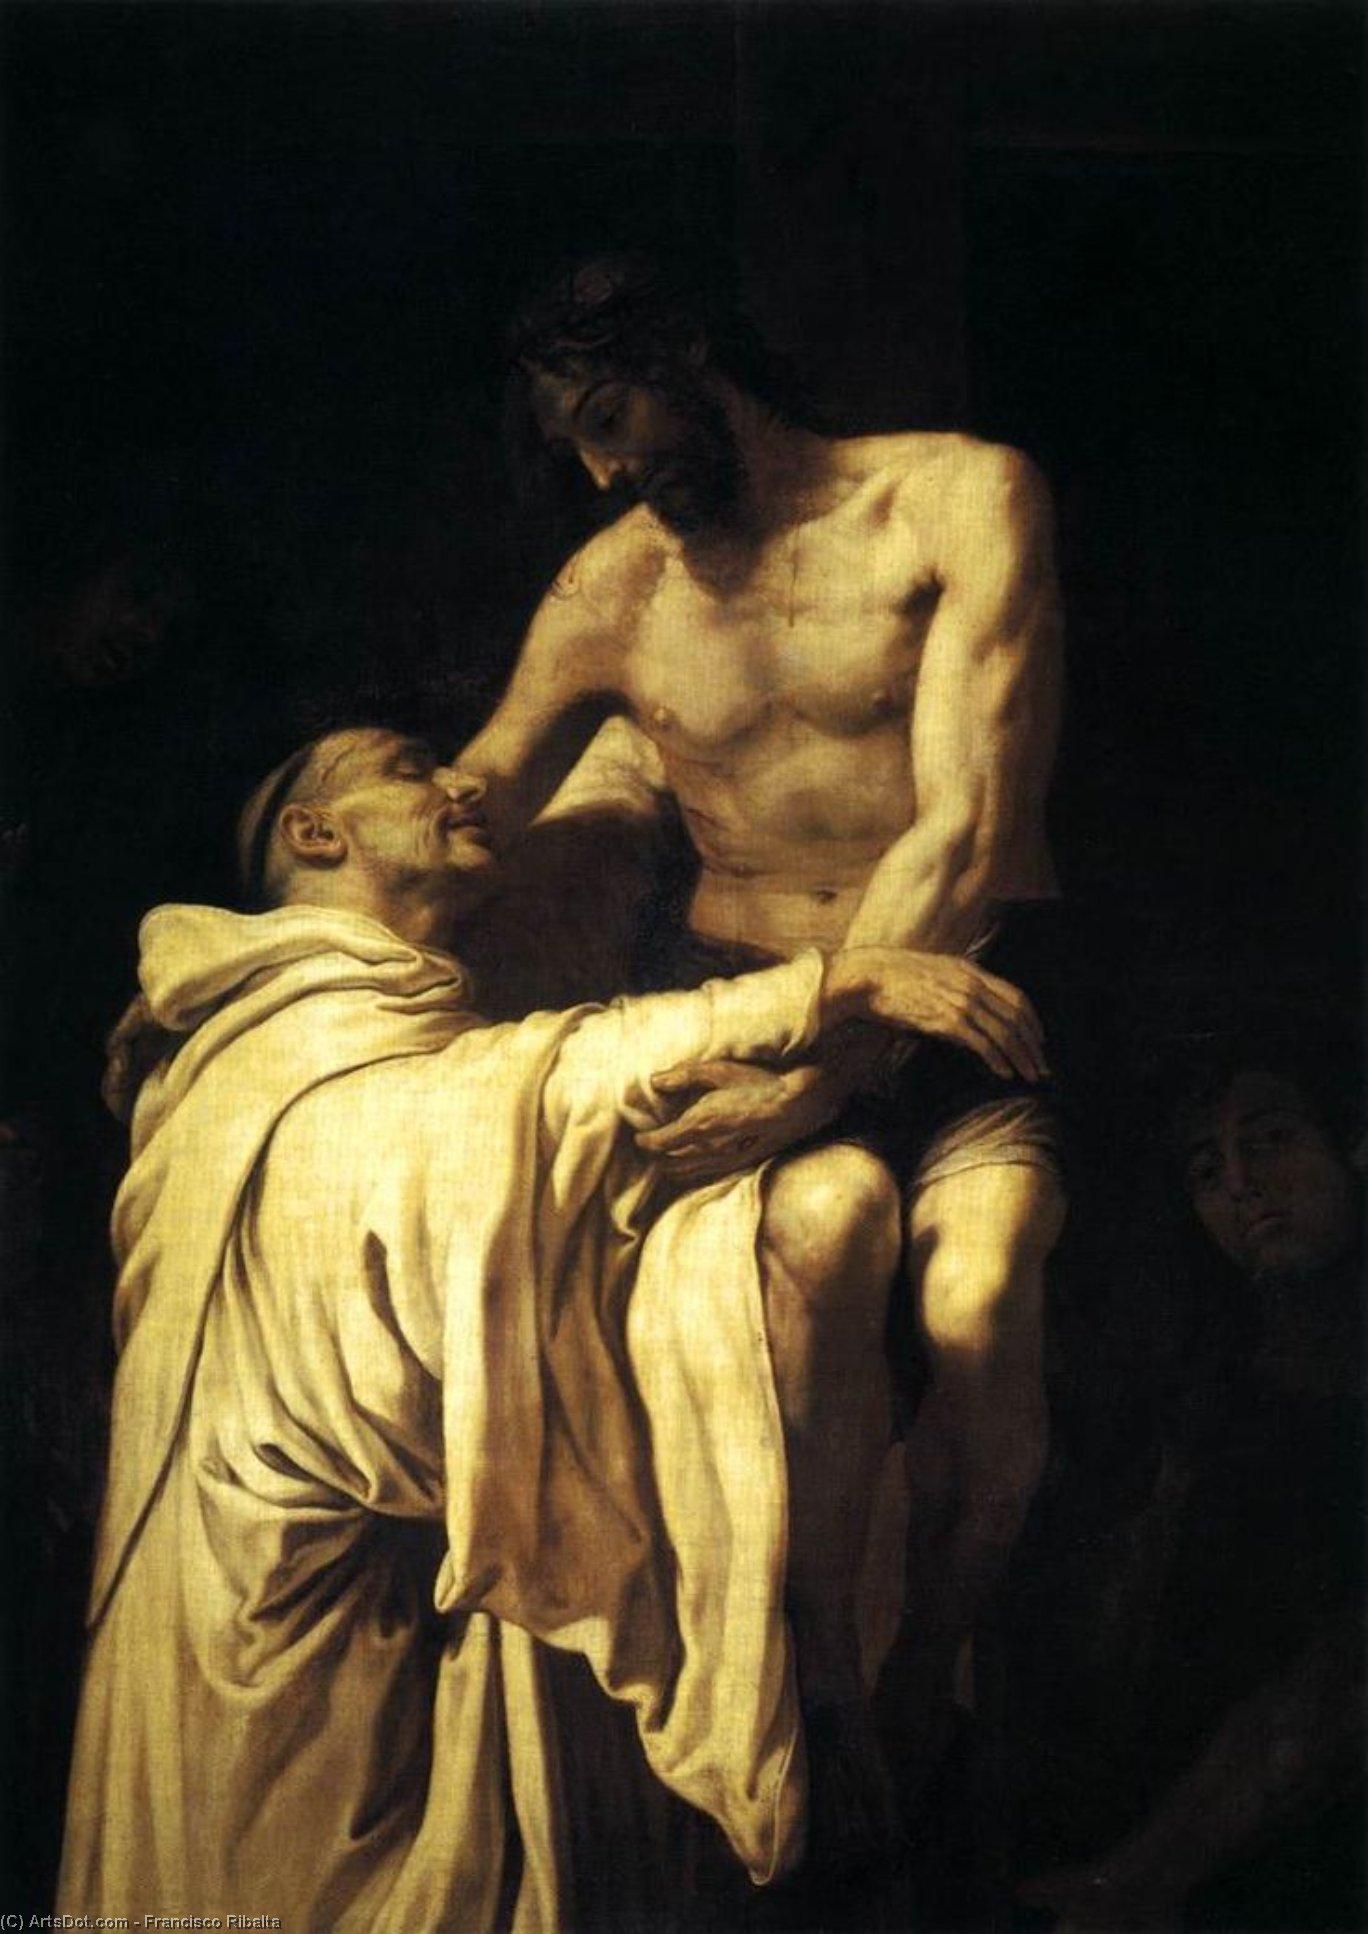 Wikioo.org - The Encyclopedia of Fine Arts - Painting, Artwork by Francisco Ribalta - Christ Embracing St Bernard